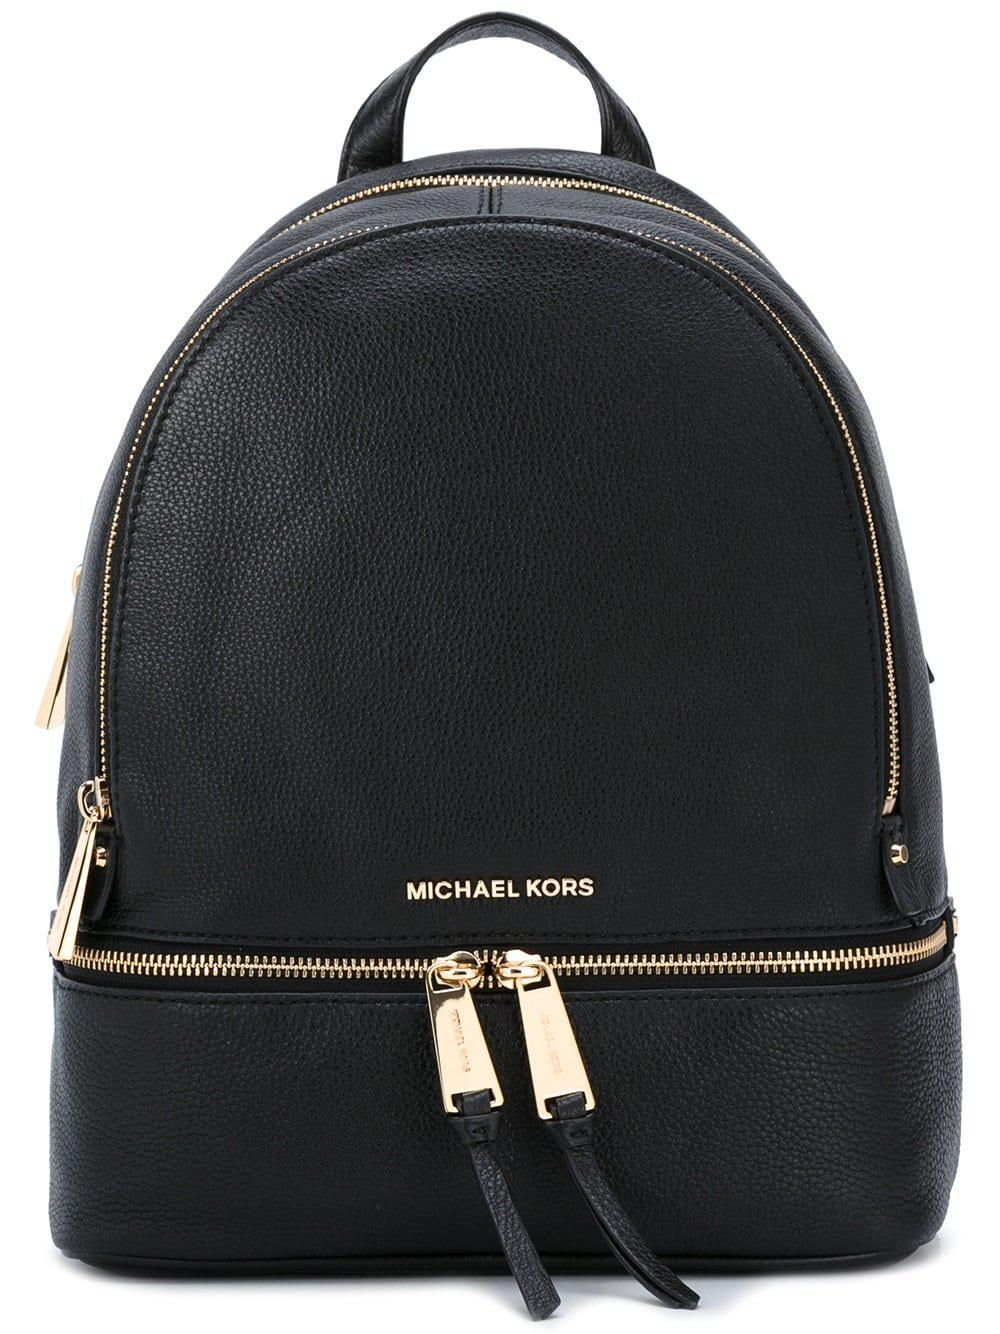 589c884b5336 Lyst - MICHAEL Michael Kors Rhea Zip Leather Backpack in Black ...